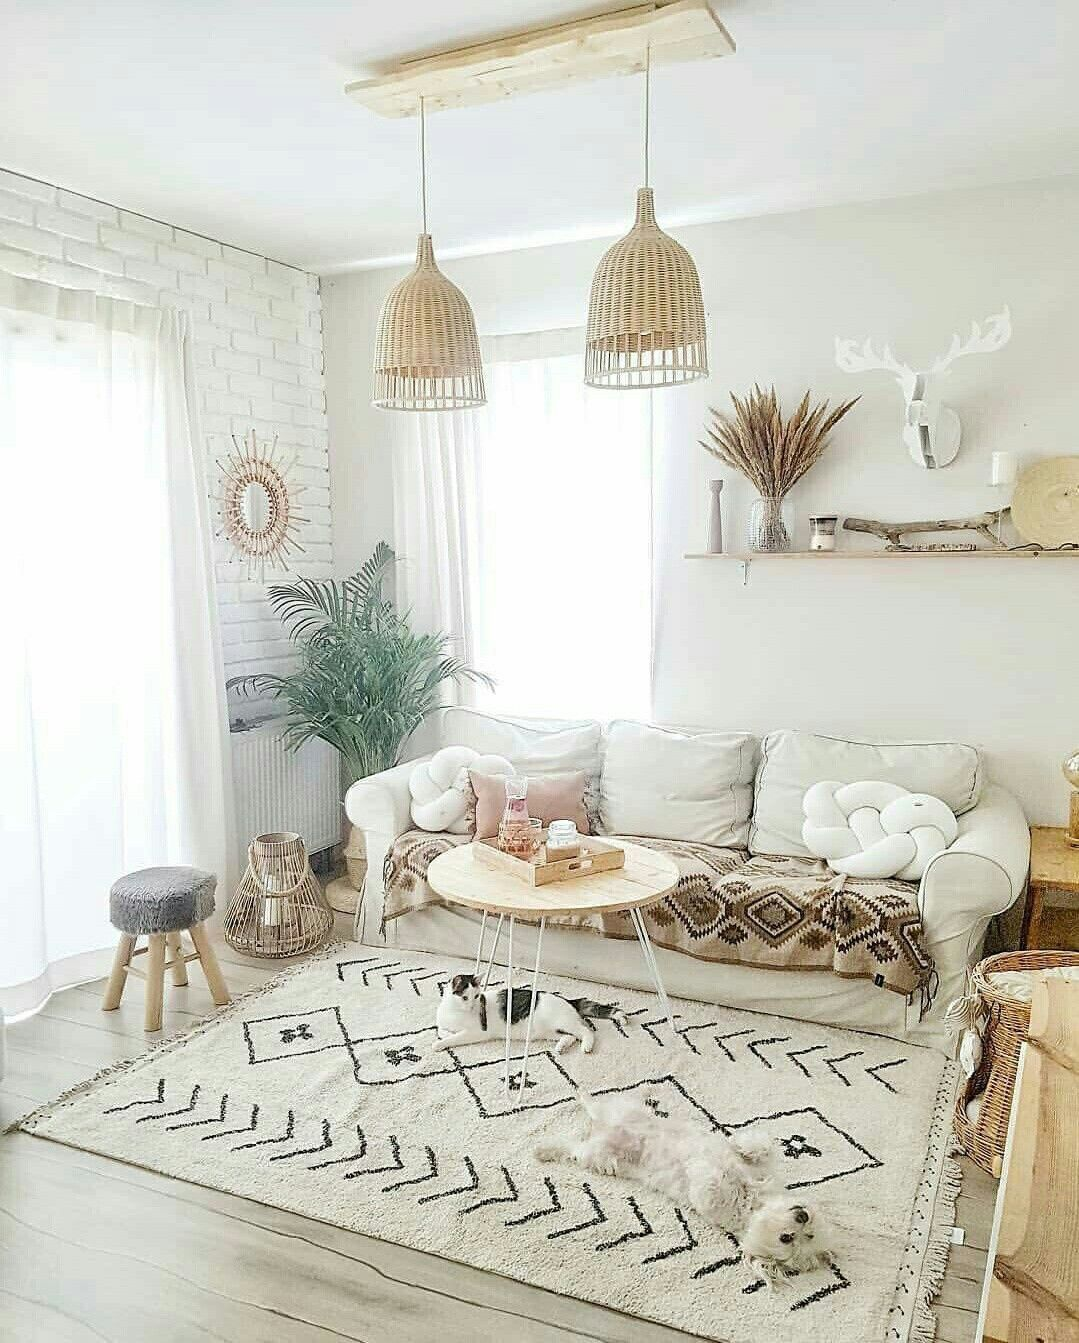 Pin On Home Decor On A Budget #white #boho #living #room